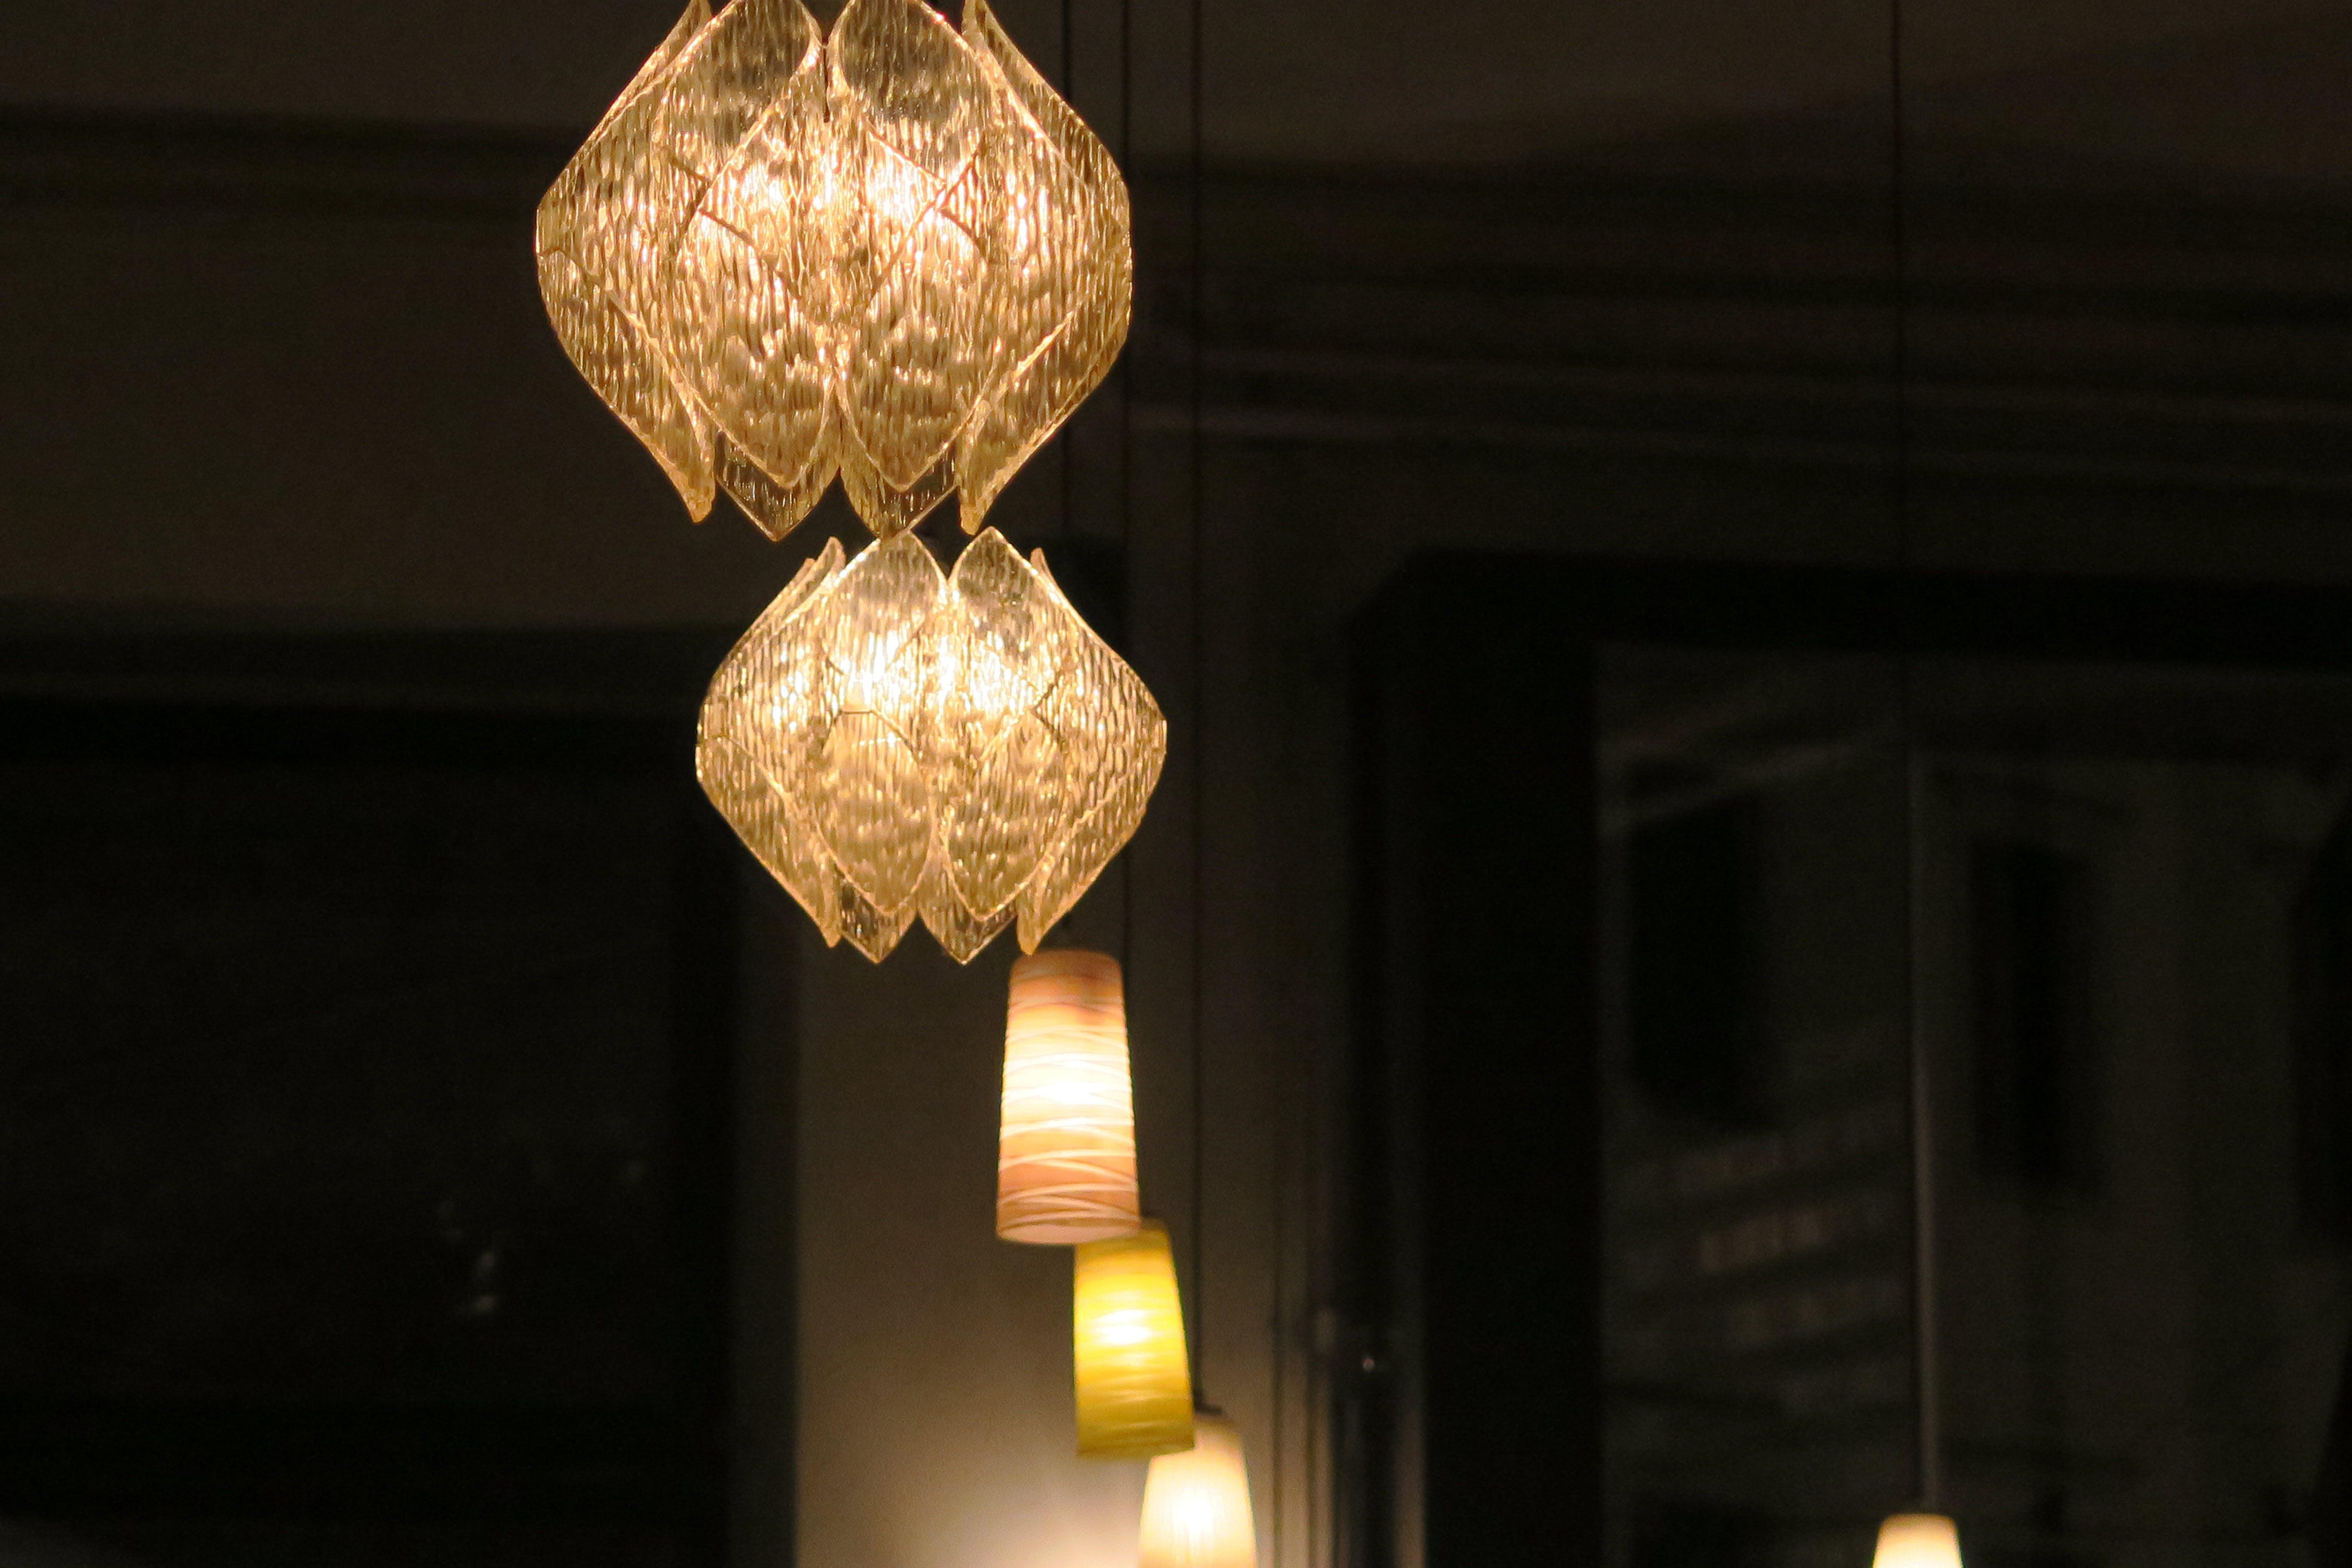 Free stock photo of theme light